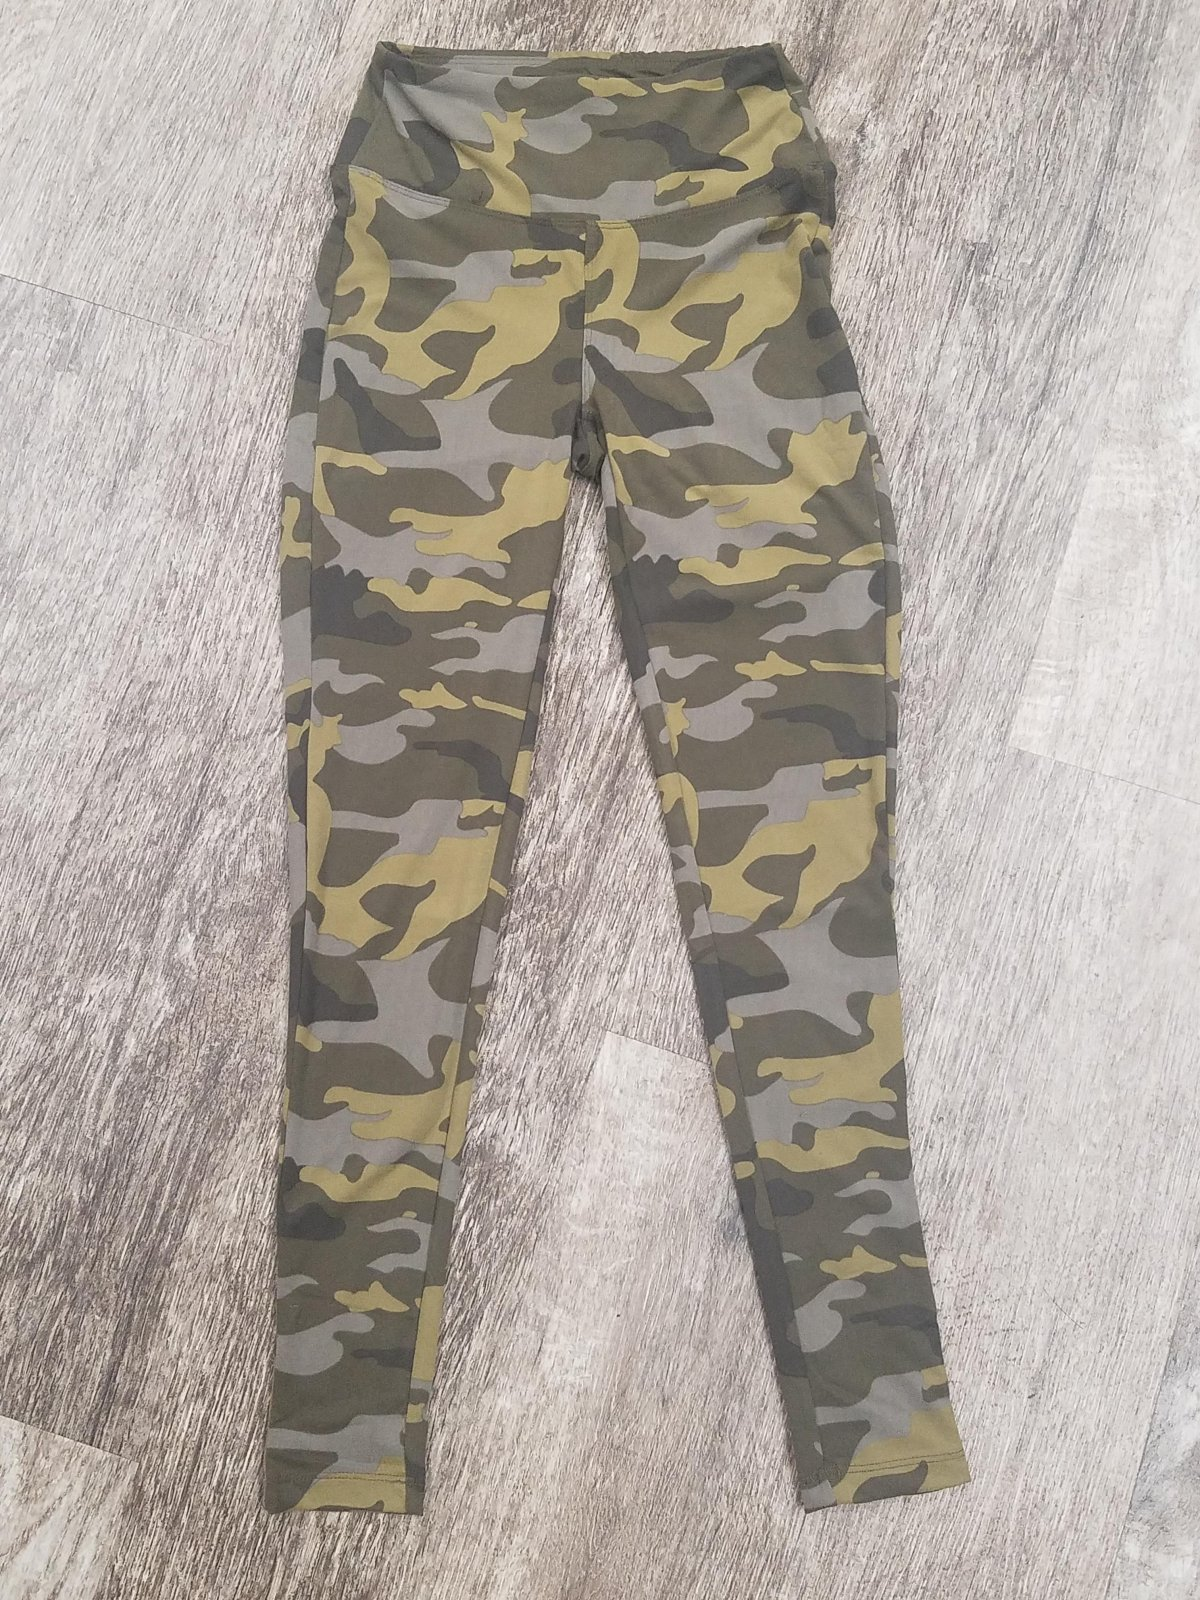 Camo Activewear Leggings